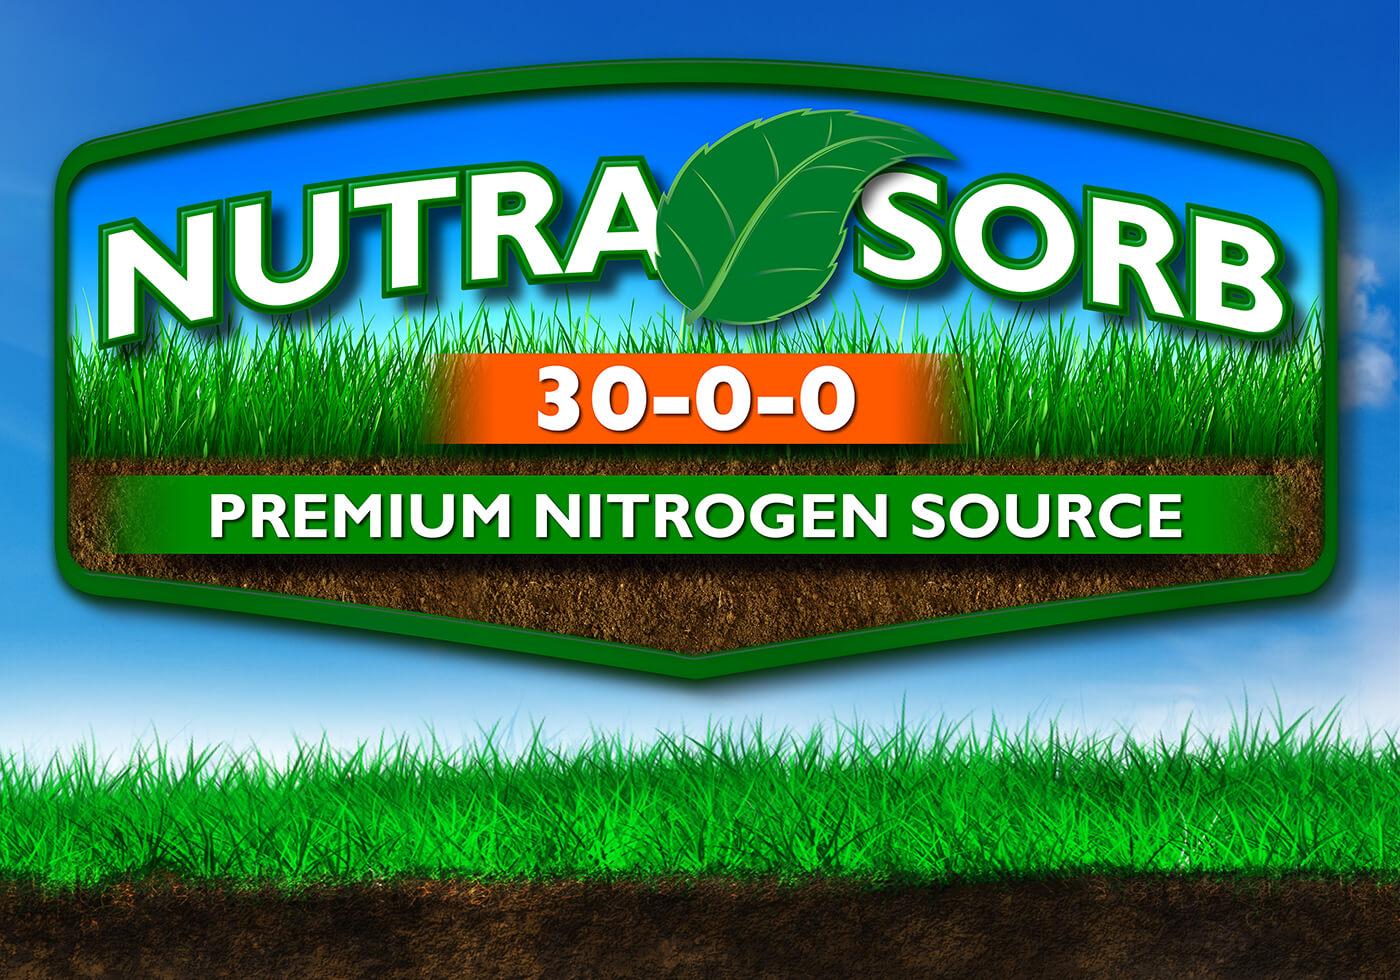 Nutra-Sorb 30-0-0